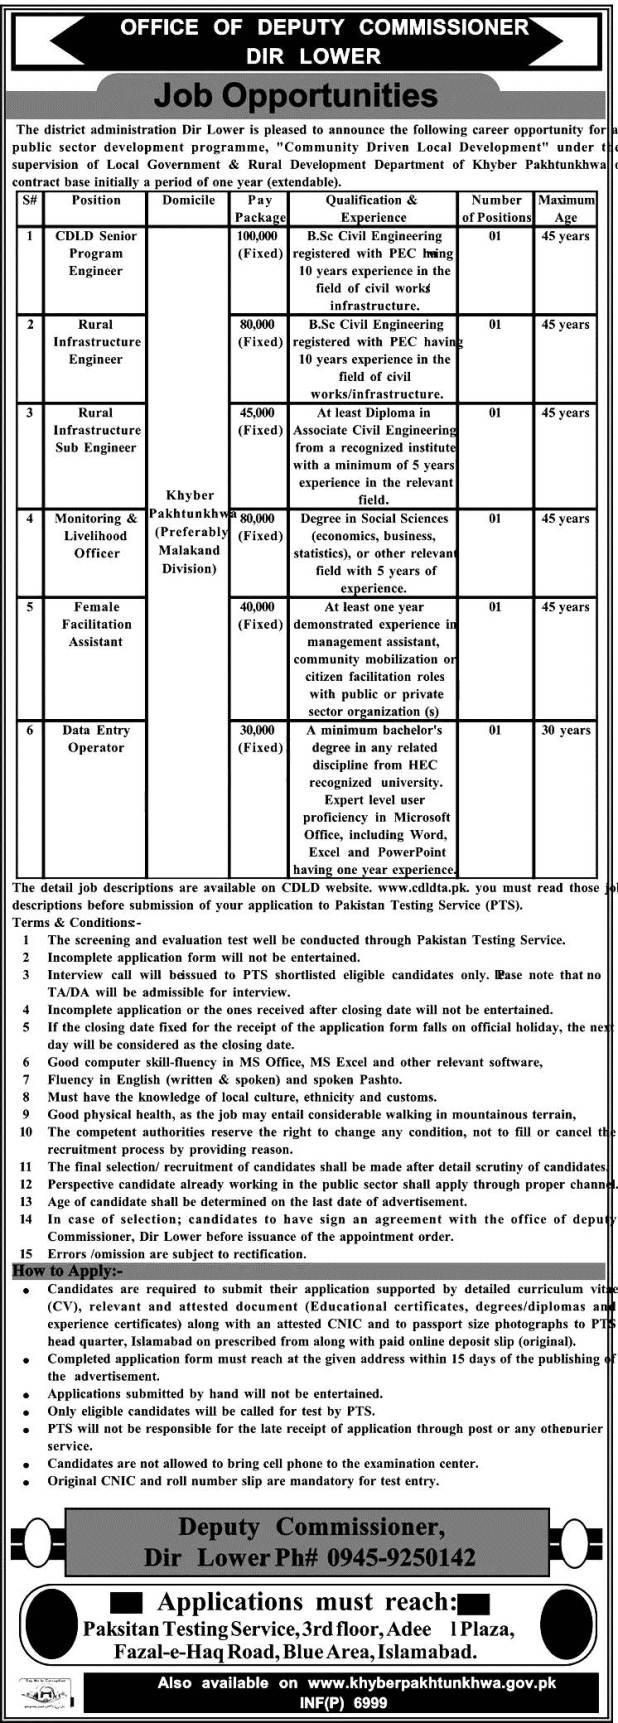 Lower Dir Office of Deputy Commissioner Jobs December 2017 Application Form Merit List PTS Test Roll Number Slips Answer Key Result